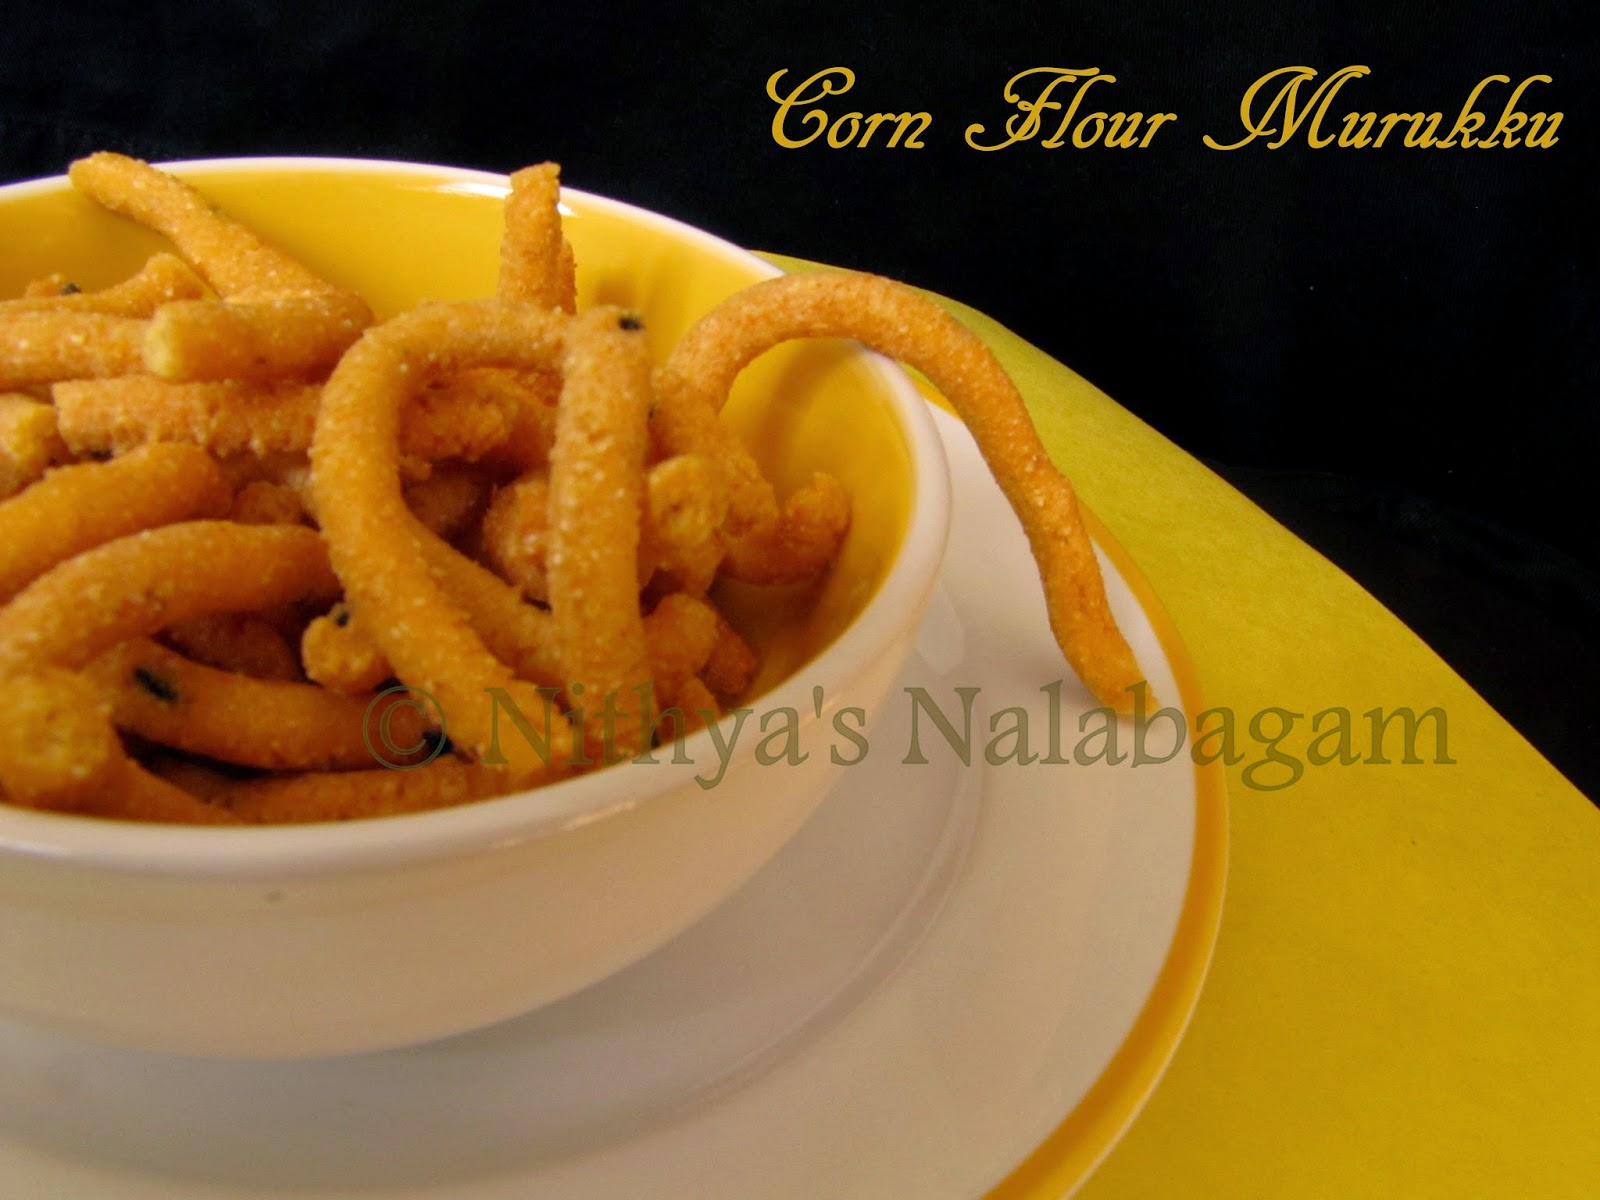 Corn flour murukku | Chola Maavu Murukku